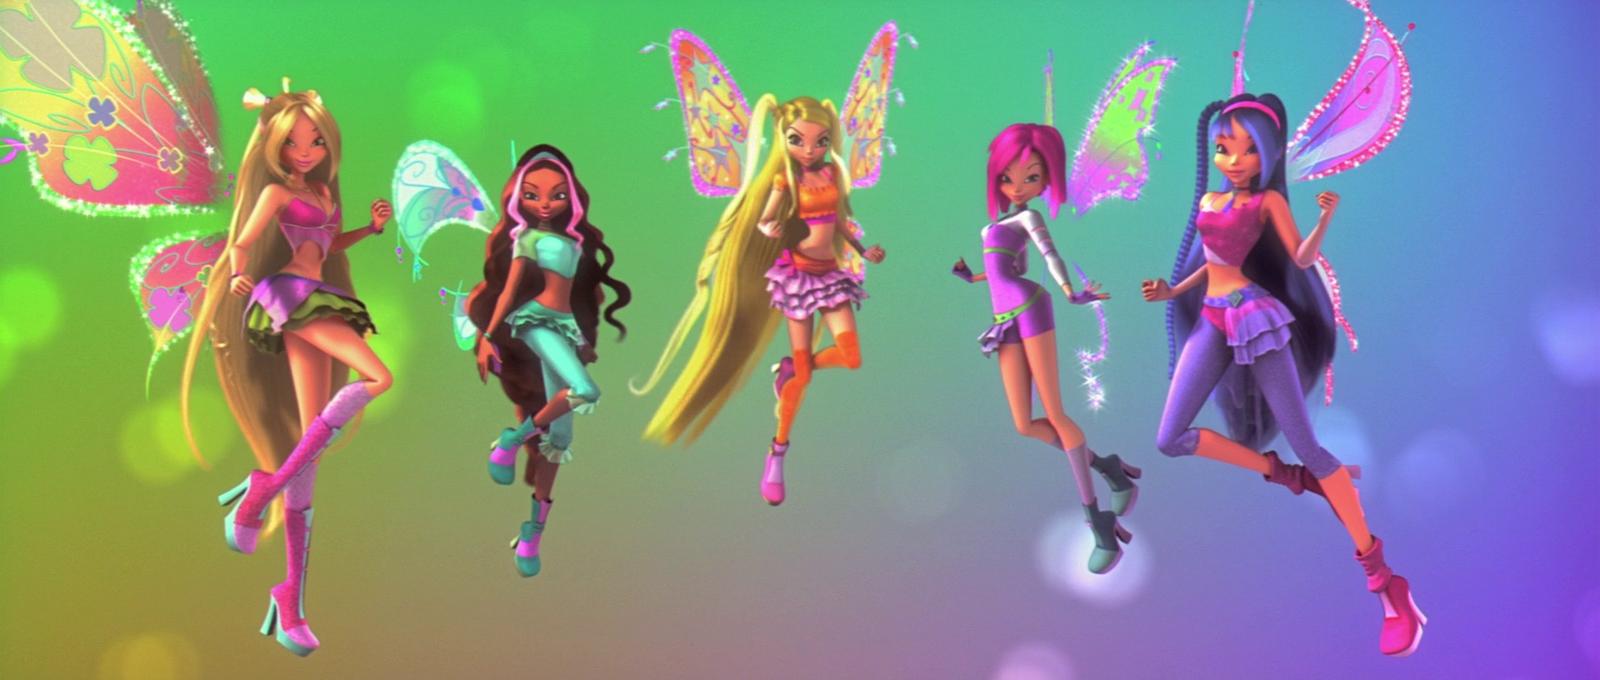 WinxClub4Ever | News™: Winx Club 3D:Magic Adventure Awards